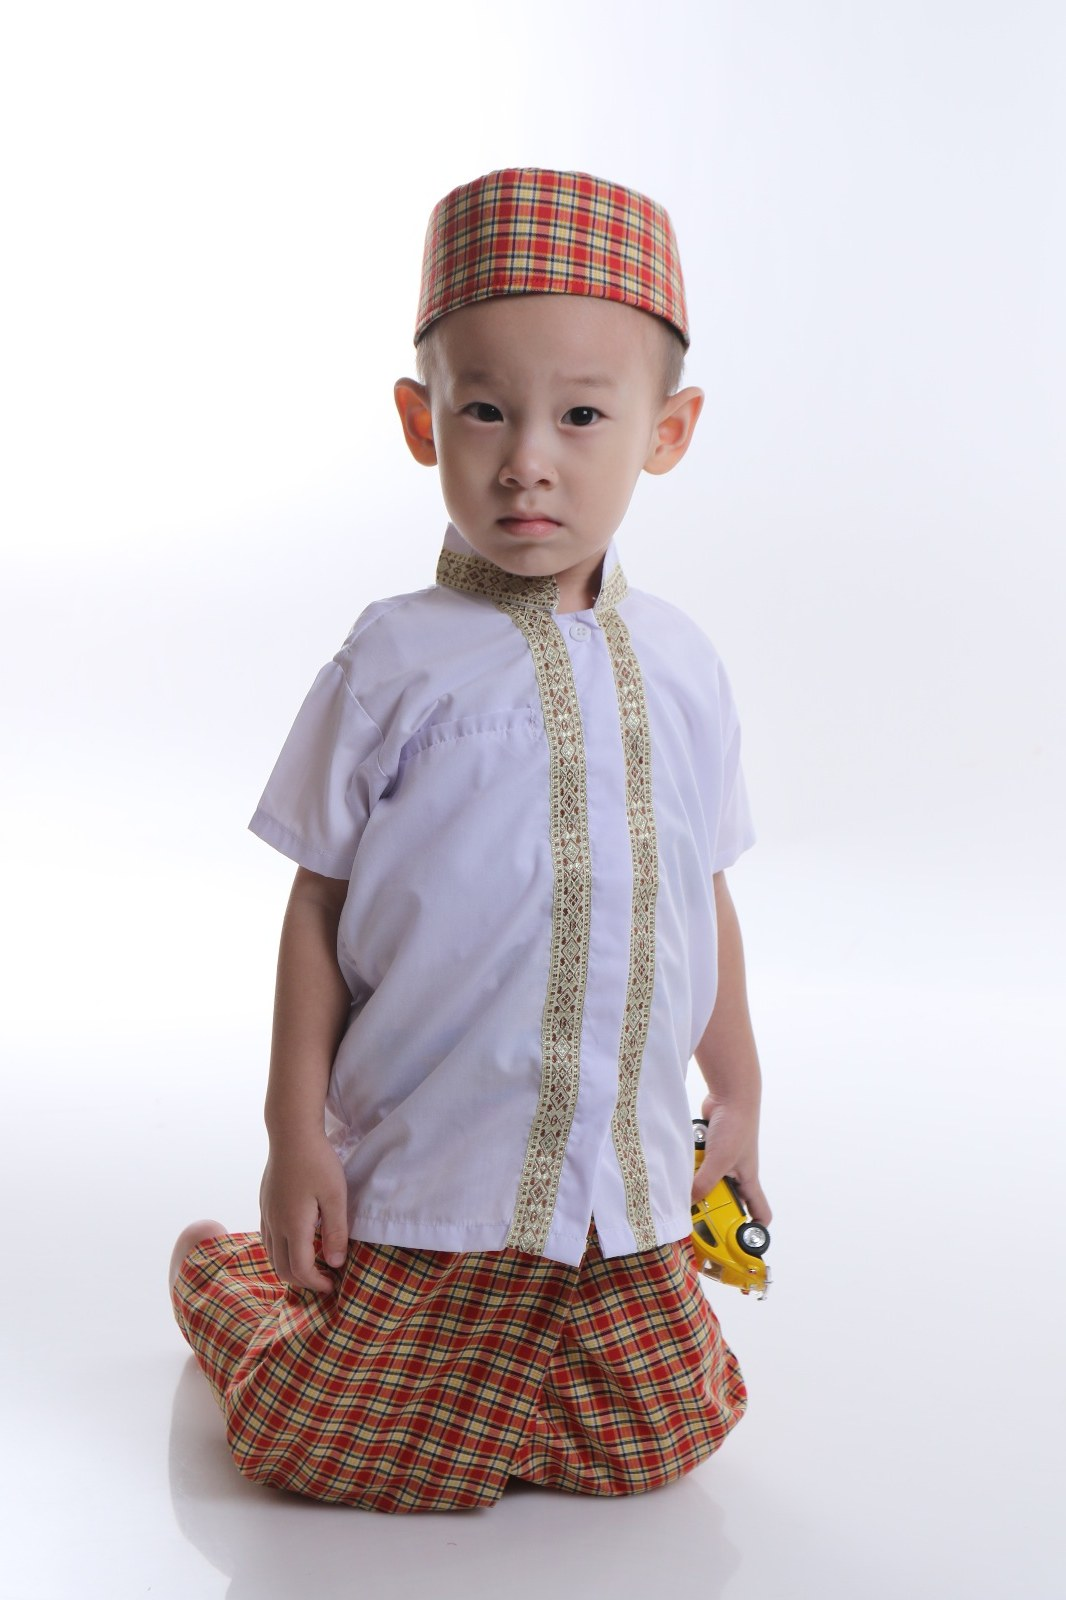 Design Model Baju Lebaran 2018 Laki Laki J7do Model Baju Muslim Untuk Anak Laki Laki Desain Terbaru